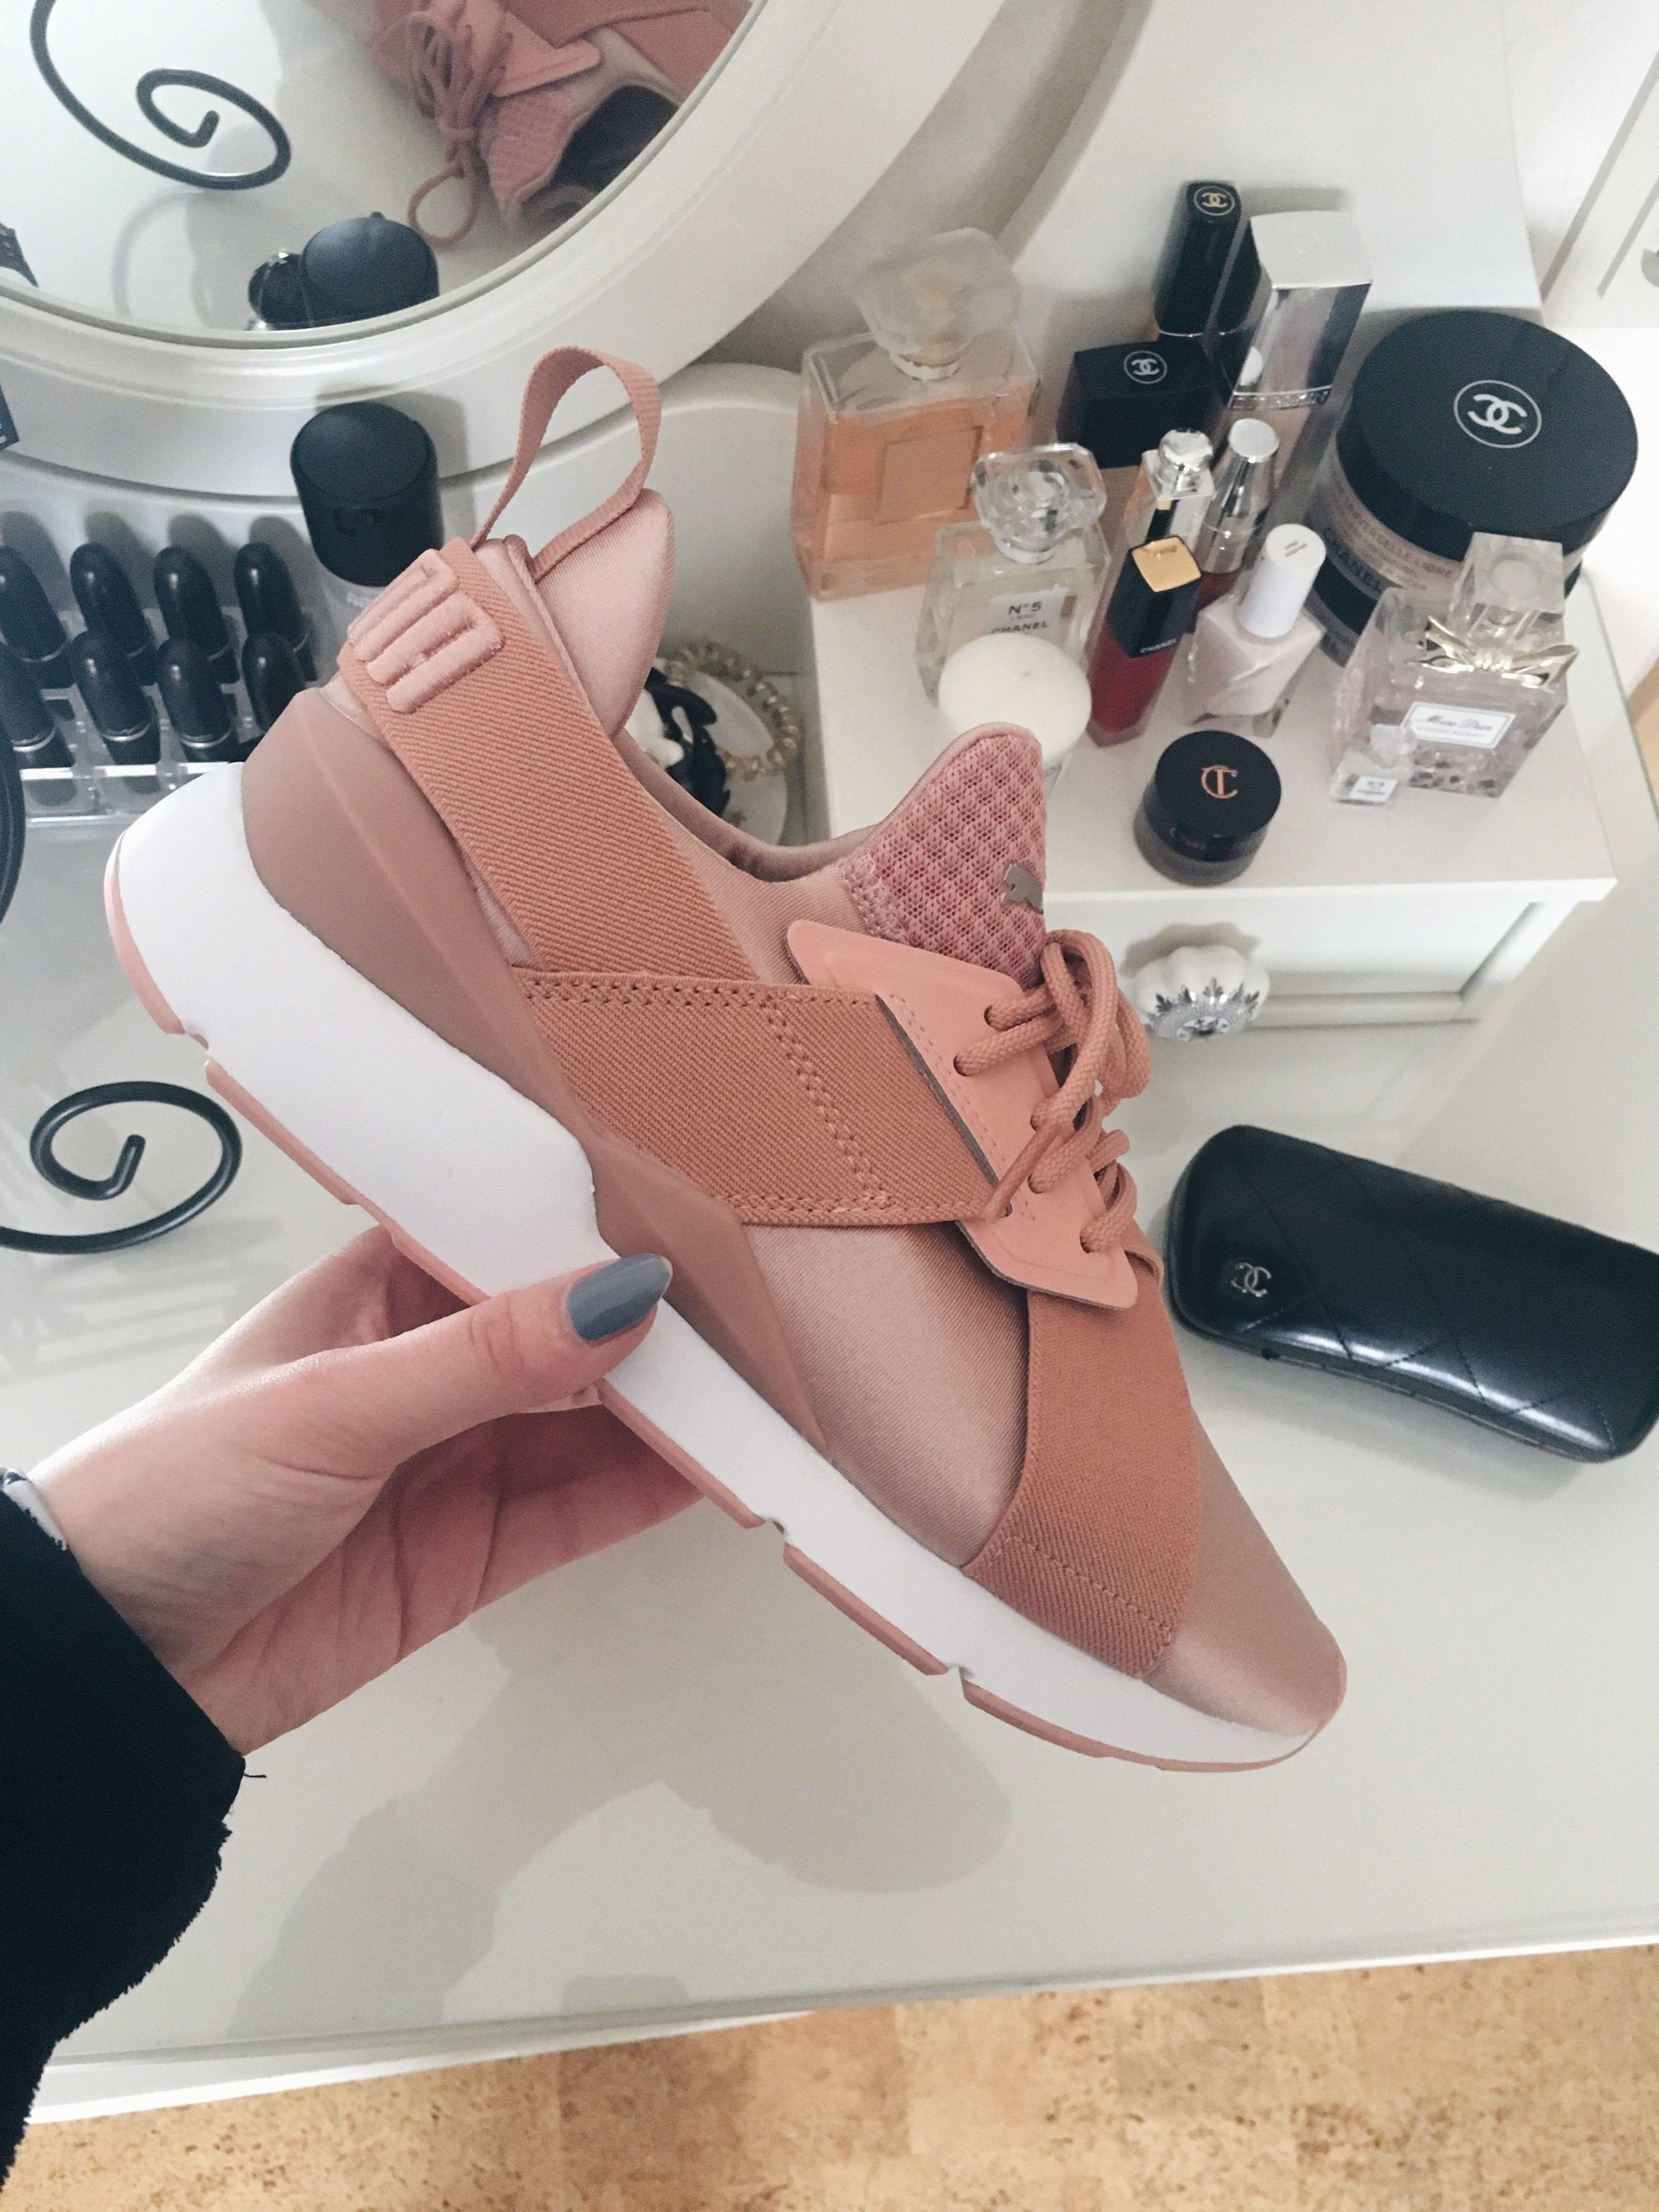 Puma Muse x Strap peach   Cute shoes, Sneakers, Pumas shoes